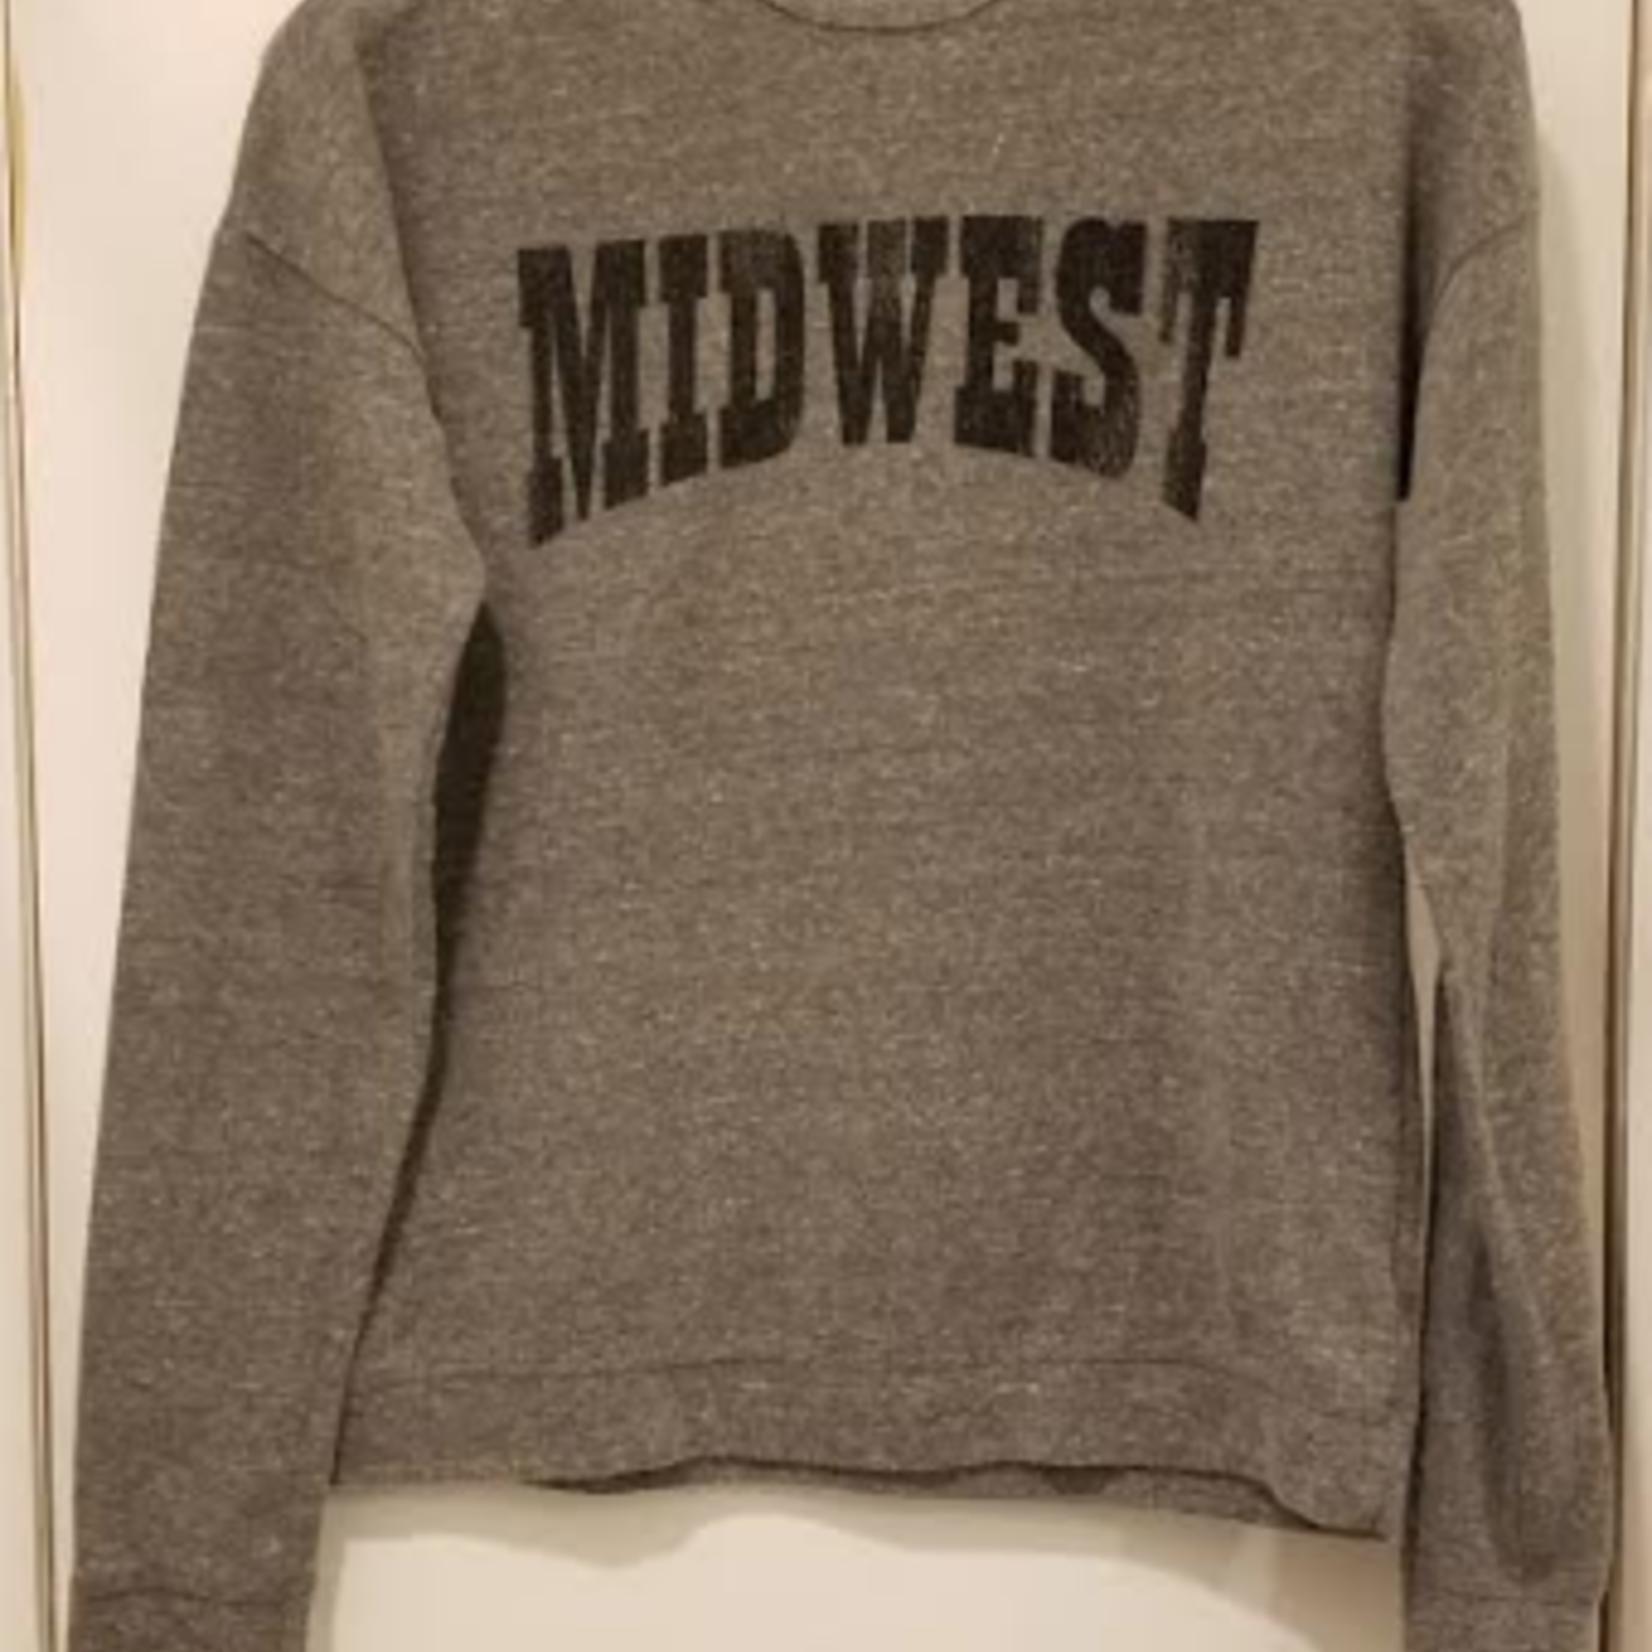 Wildcat Retro Brand Wildcat Retro Brand Midwest Sweatshirt